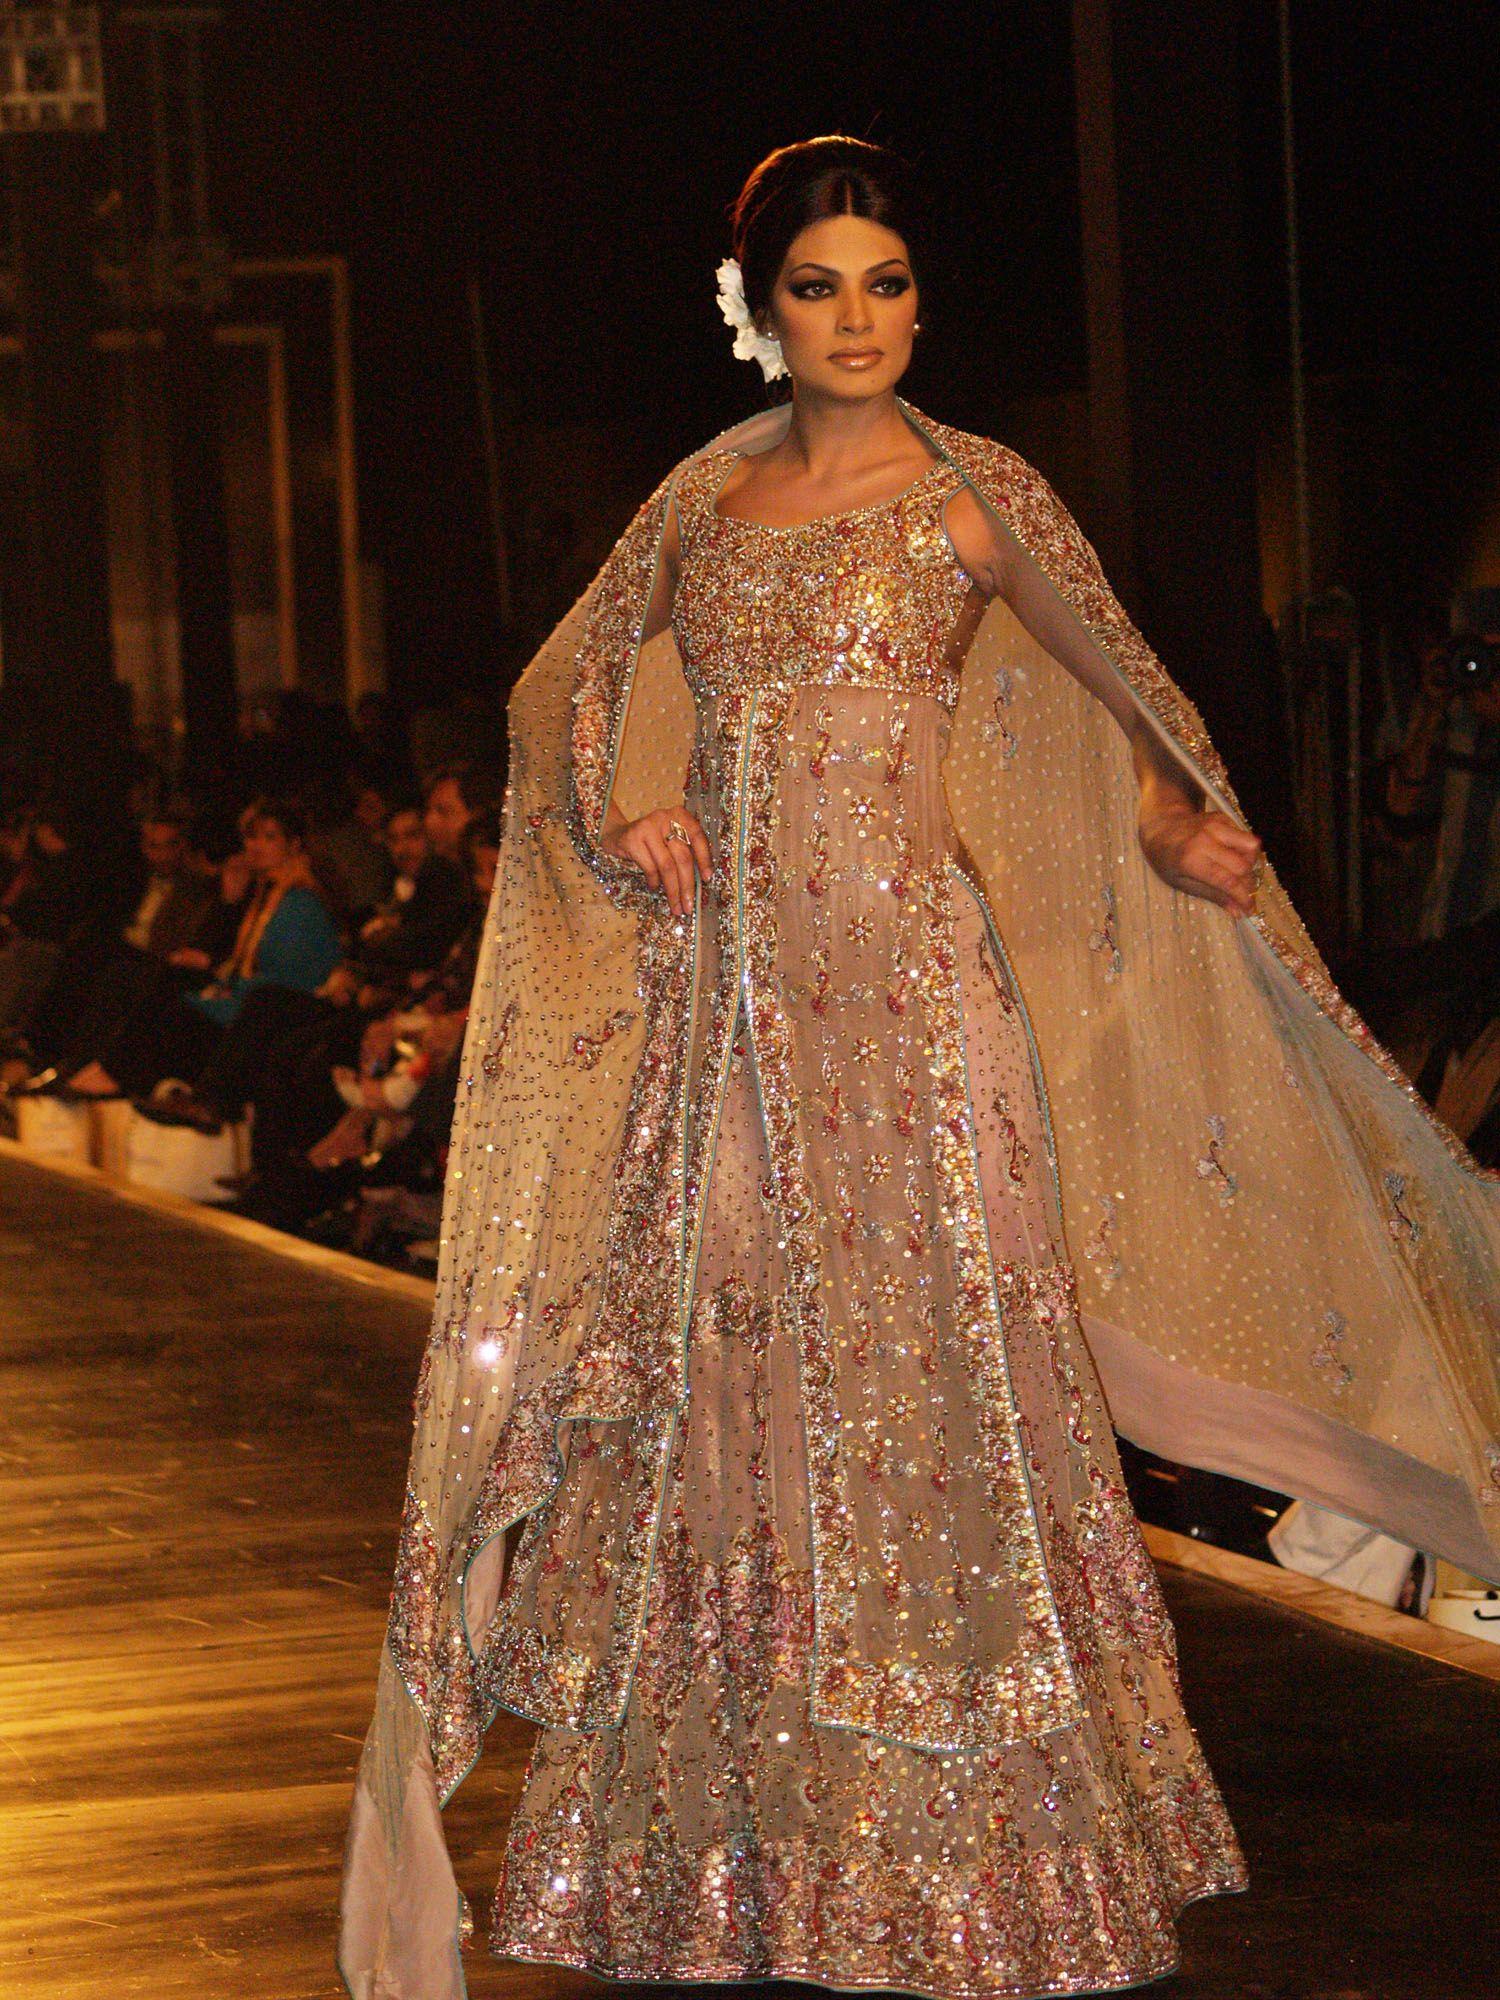 long dresses for weddings Soma Sengupta Indian Fashion Sparkling Glamor Indian Wedding DressesIndian